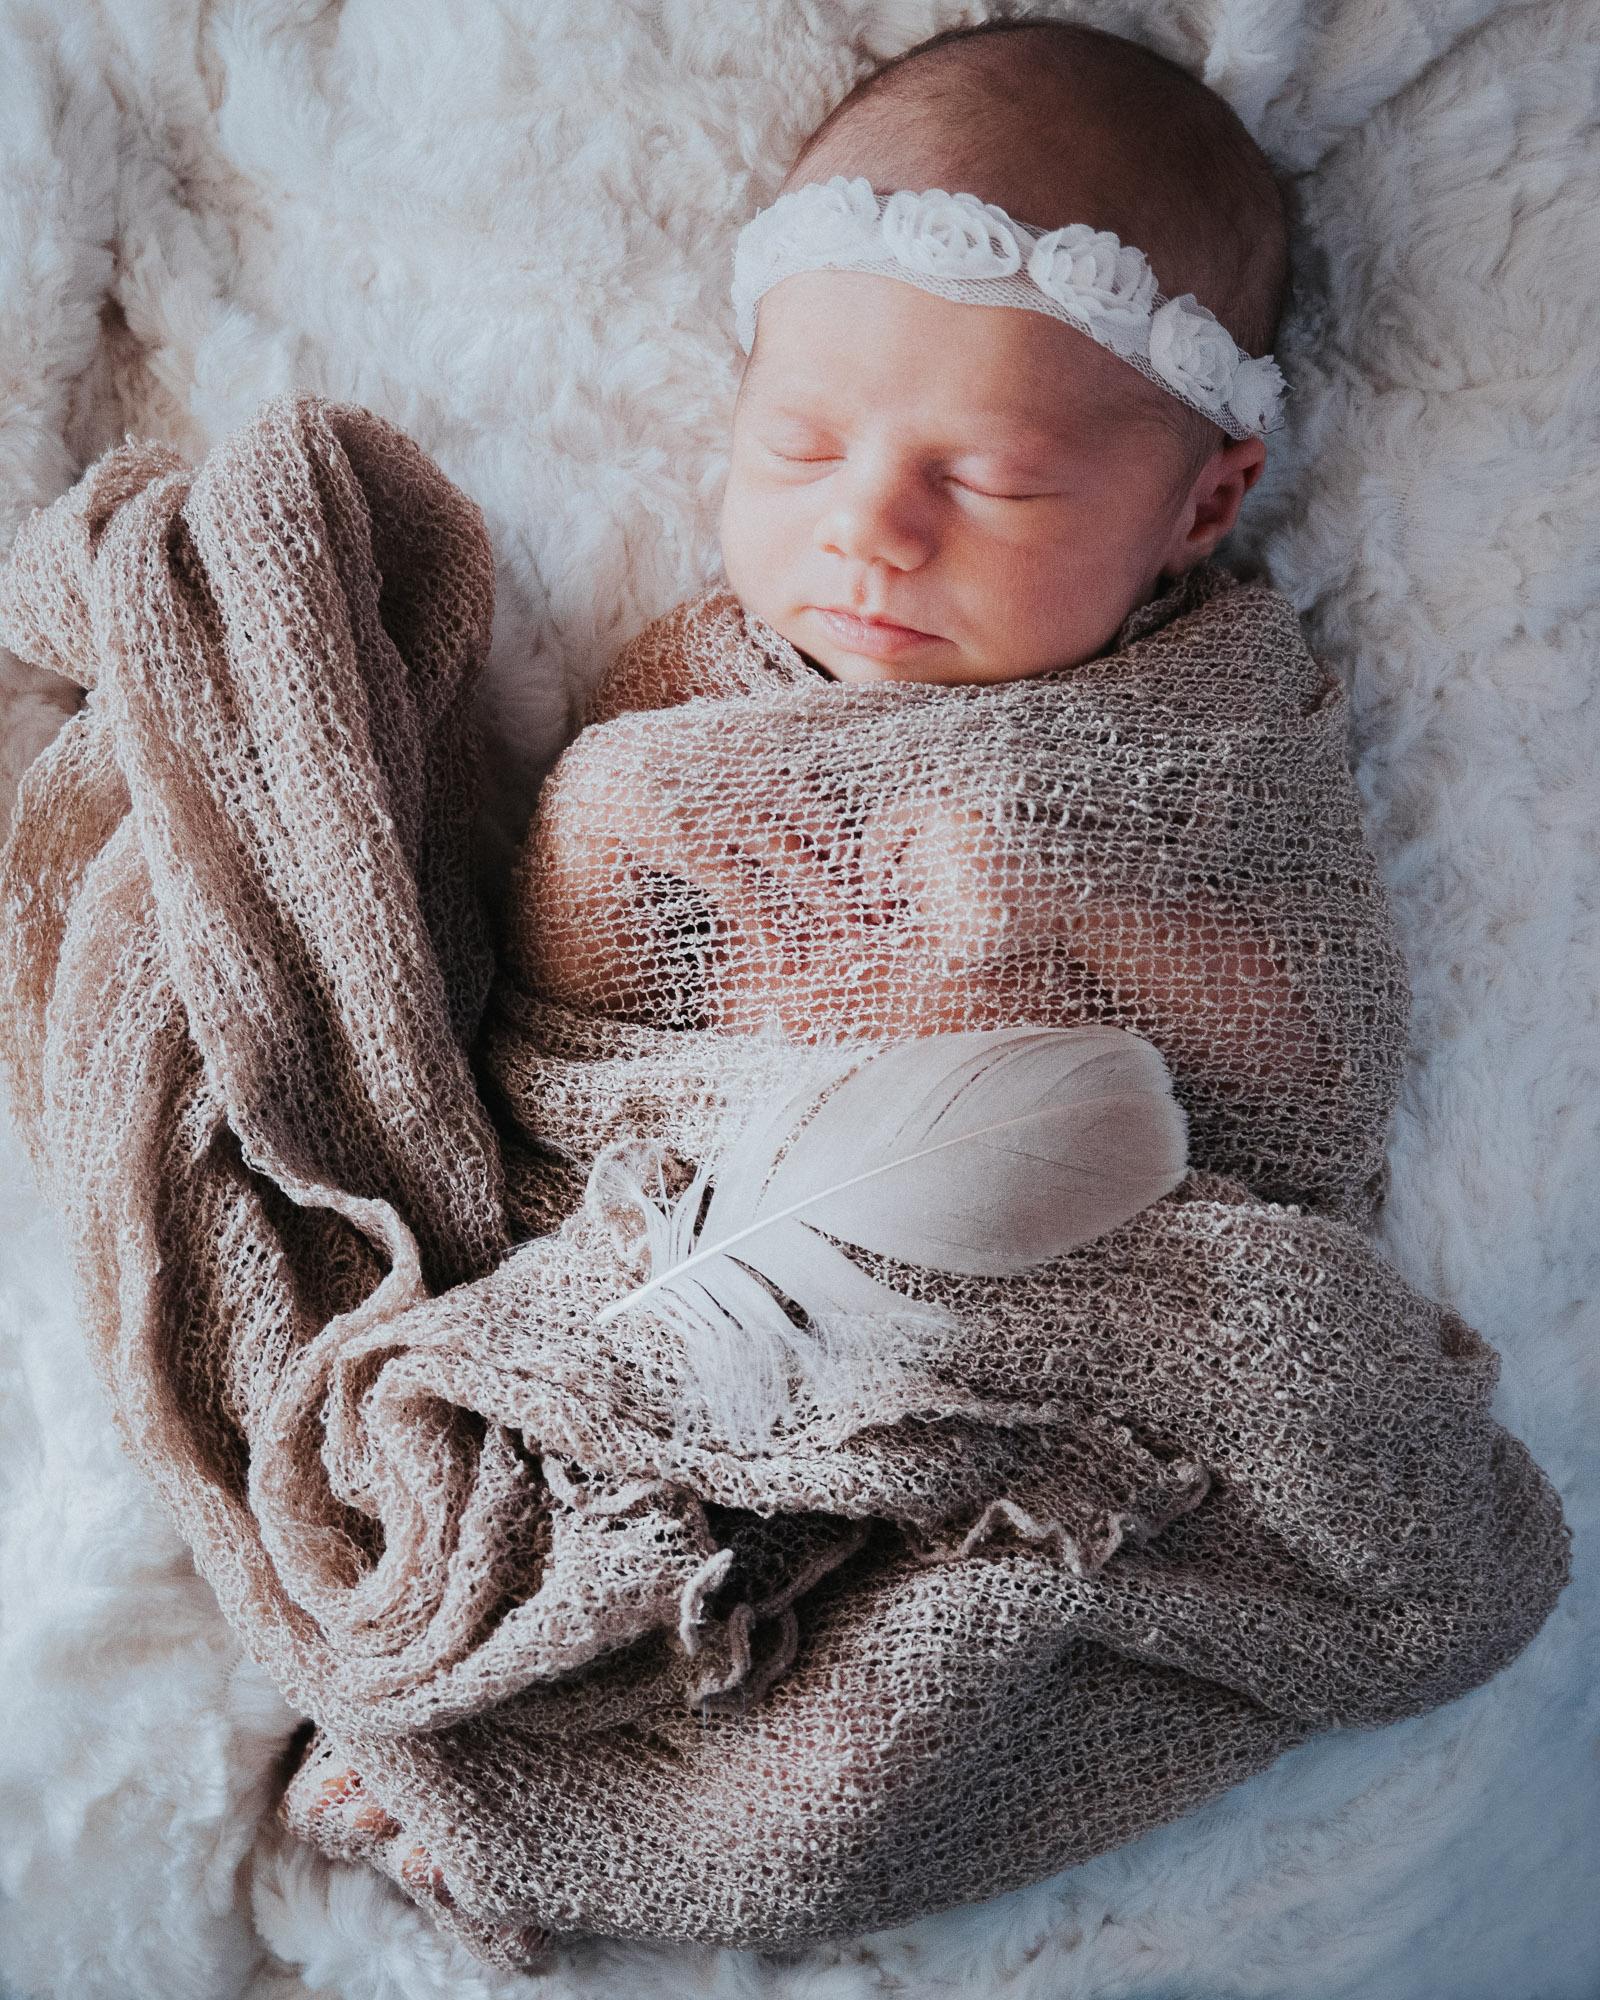 Newborn photographer on location in home